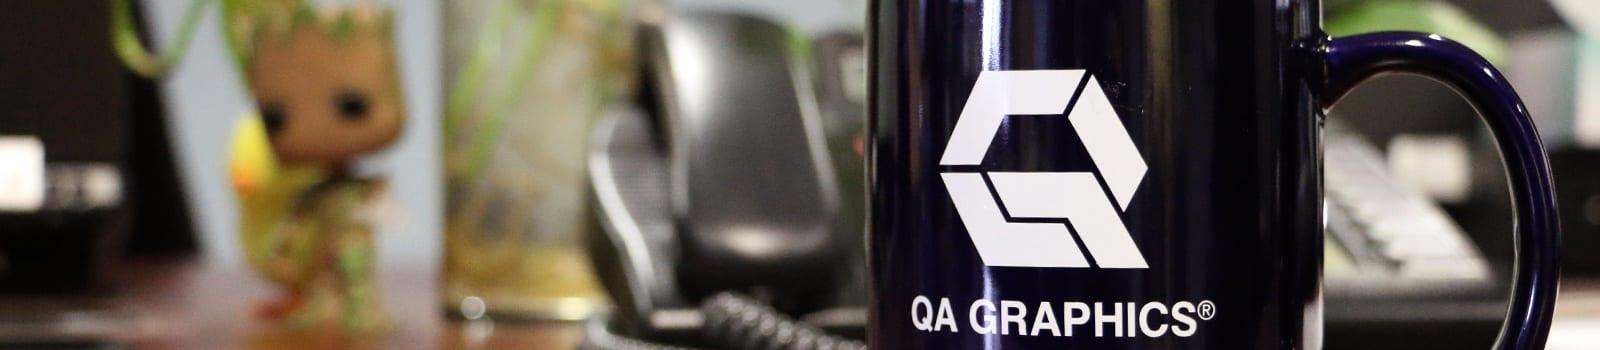 QA Graphics contact us banner